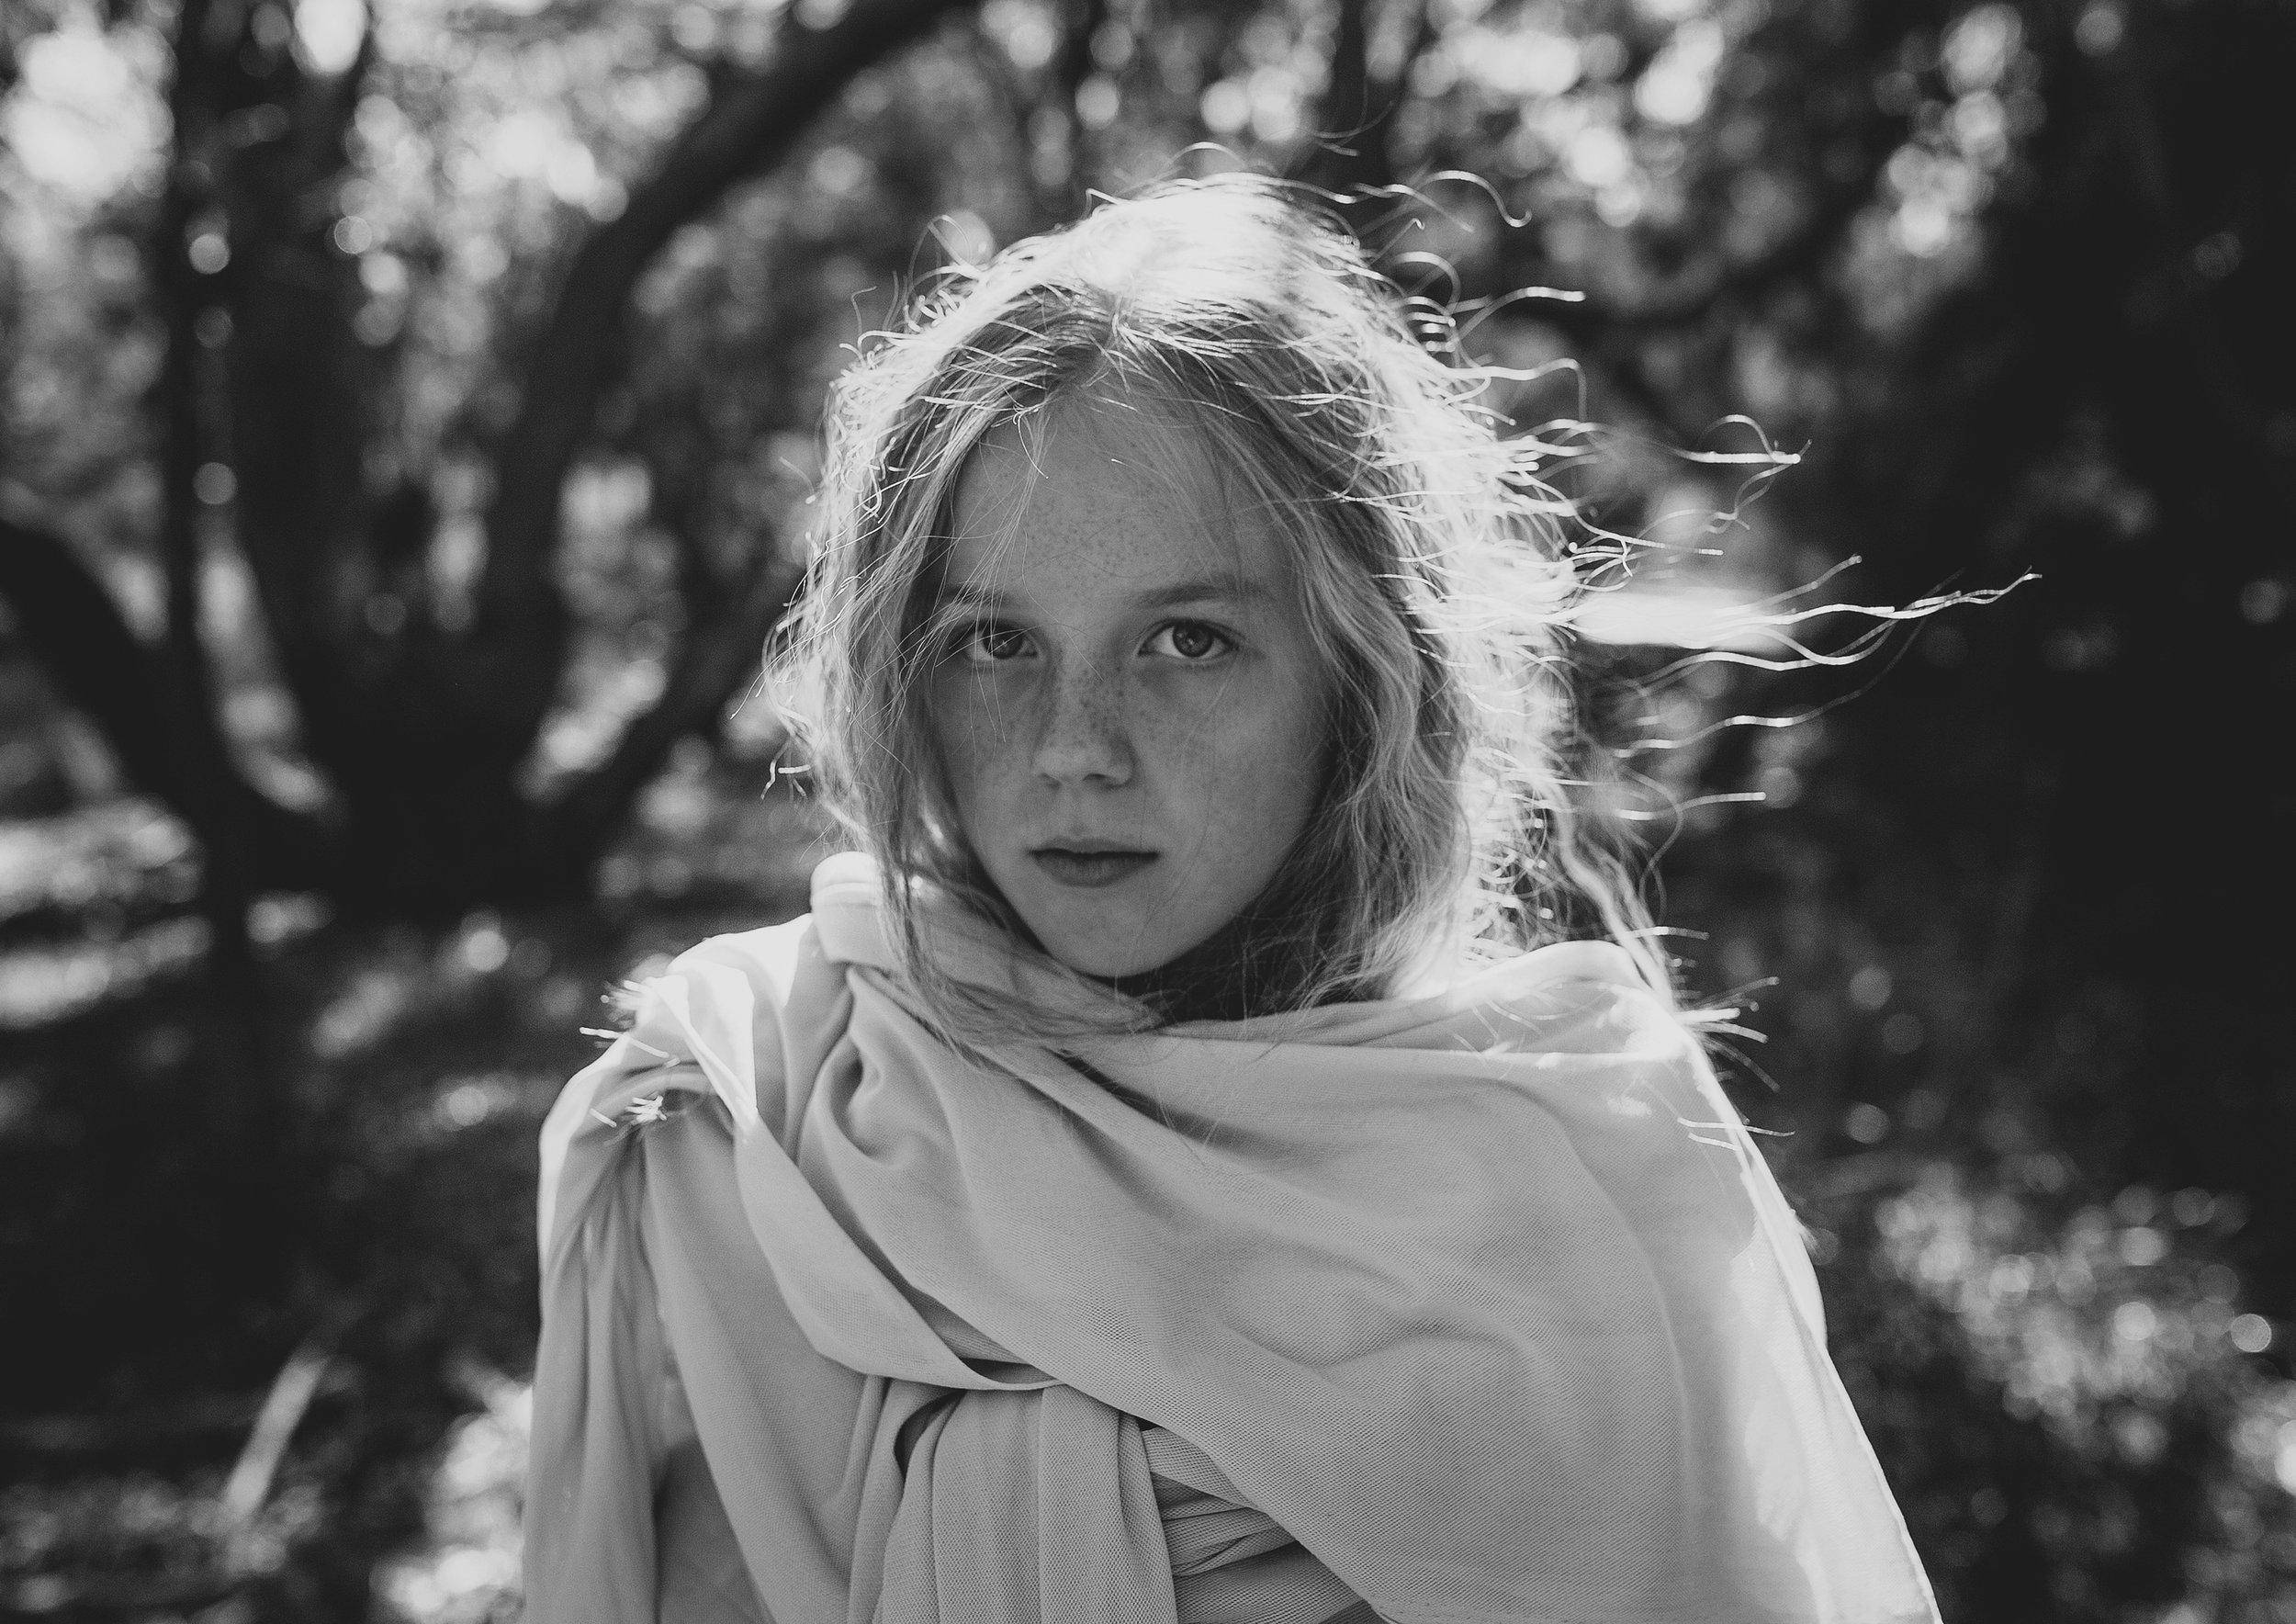 Black and White Tween photo